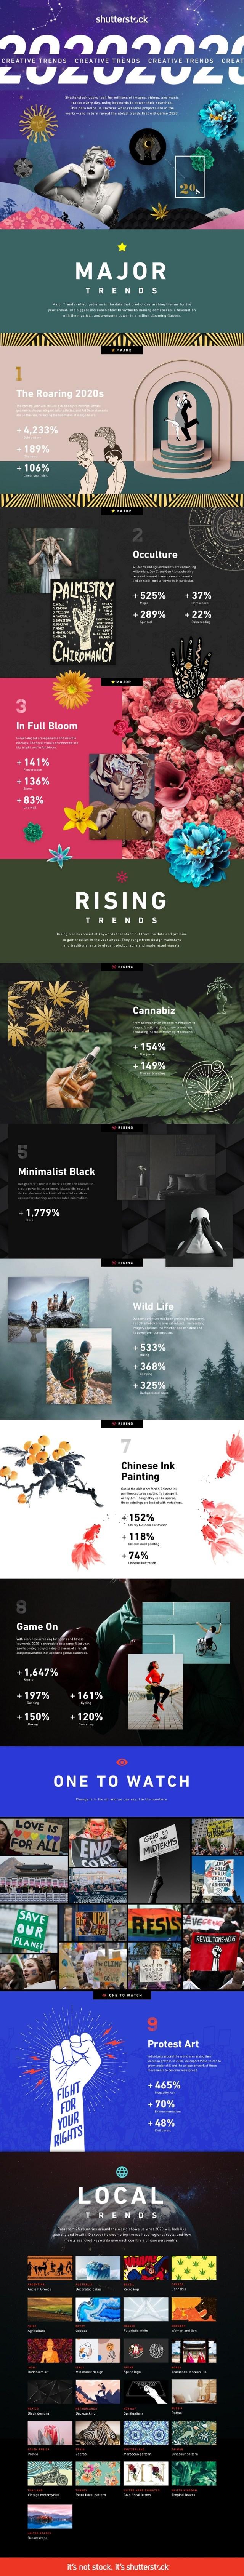 Shutterstock trends 2020